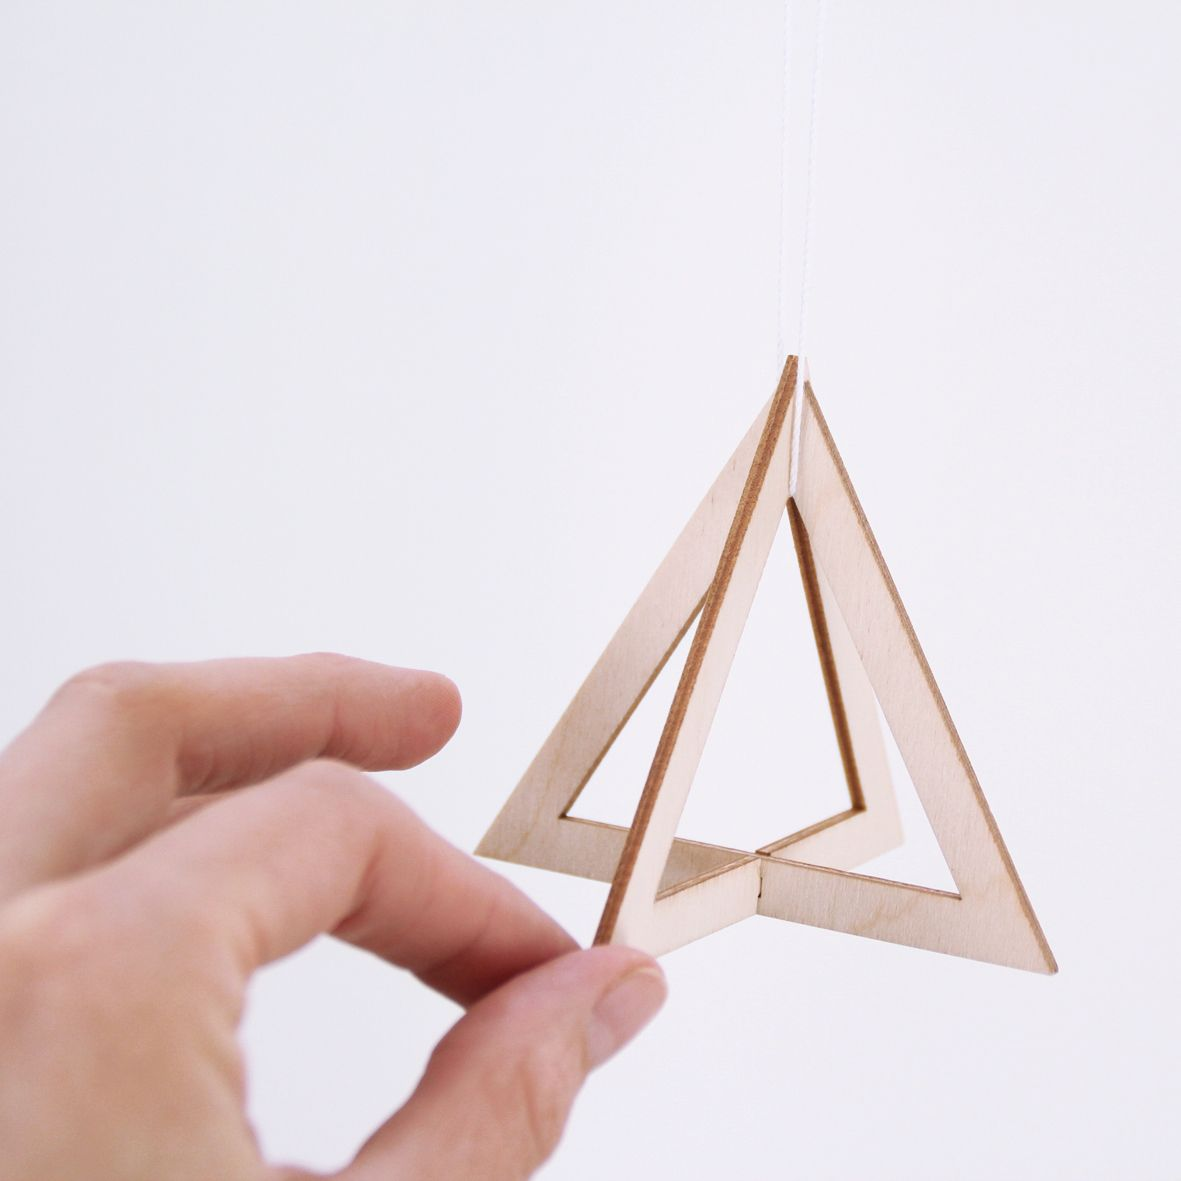 SNUG.TRIO Set of 3 wooden pendants / triangle, circle and square http://snugonline.bigcartel.com/product/snug-trio